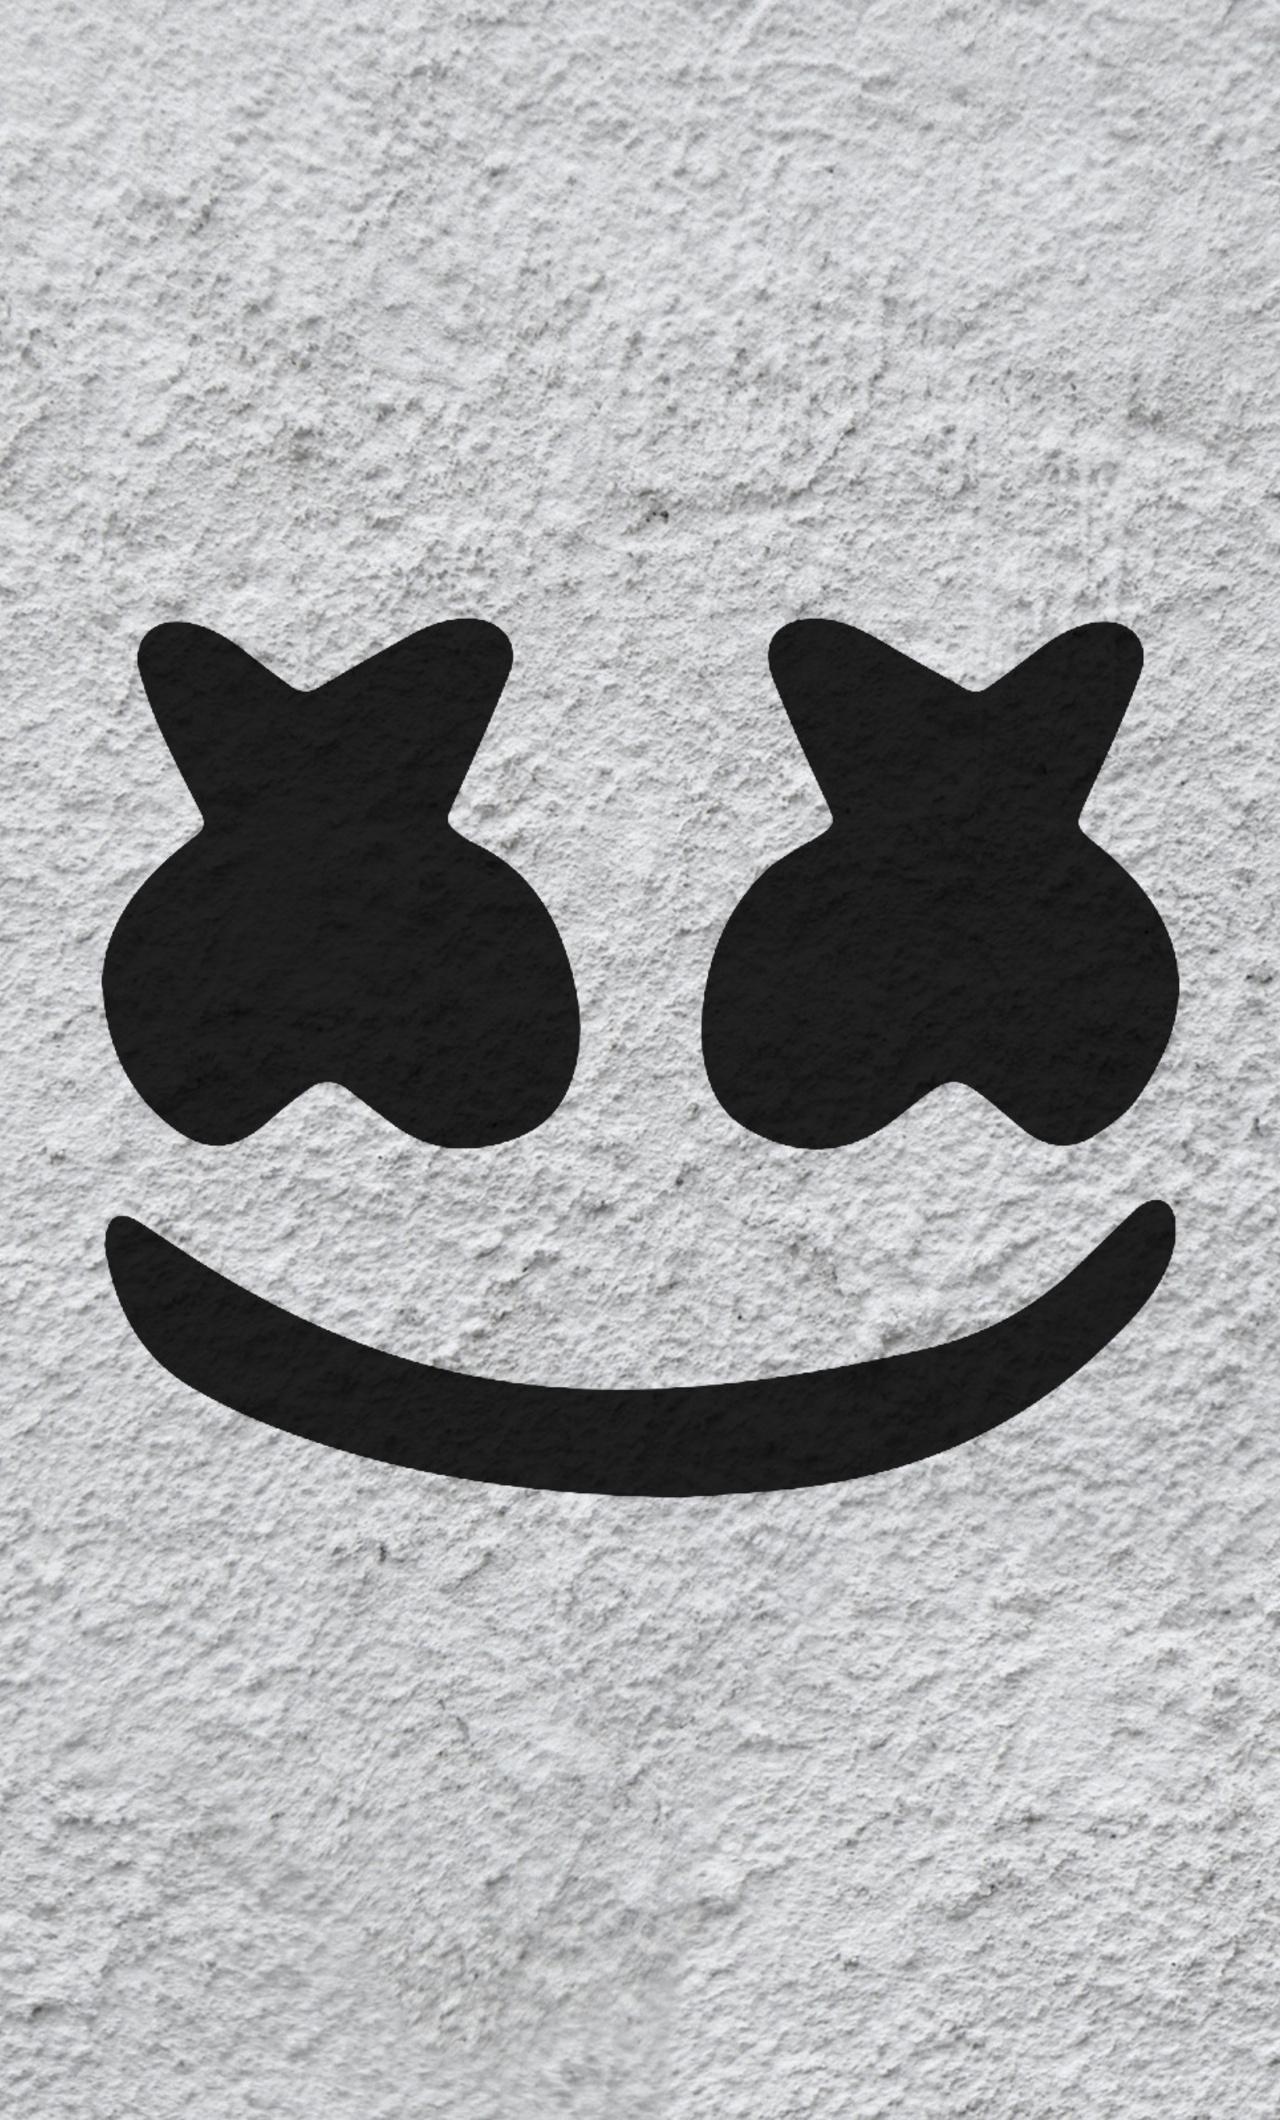 marshmello-logo-4k-lu.jpg